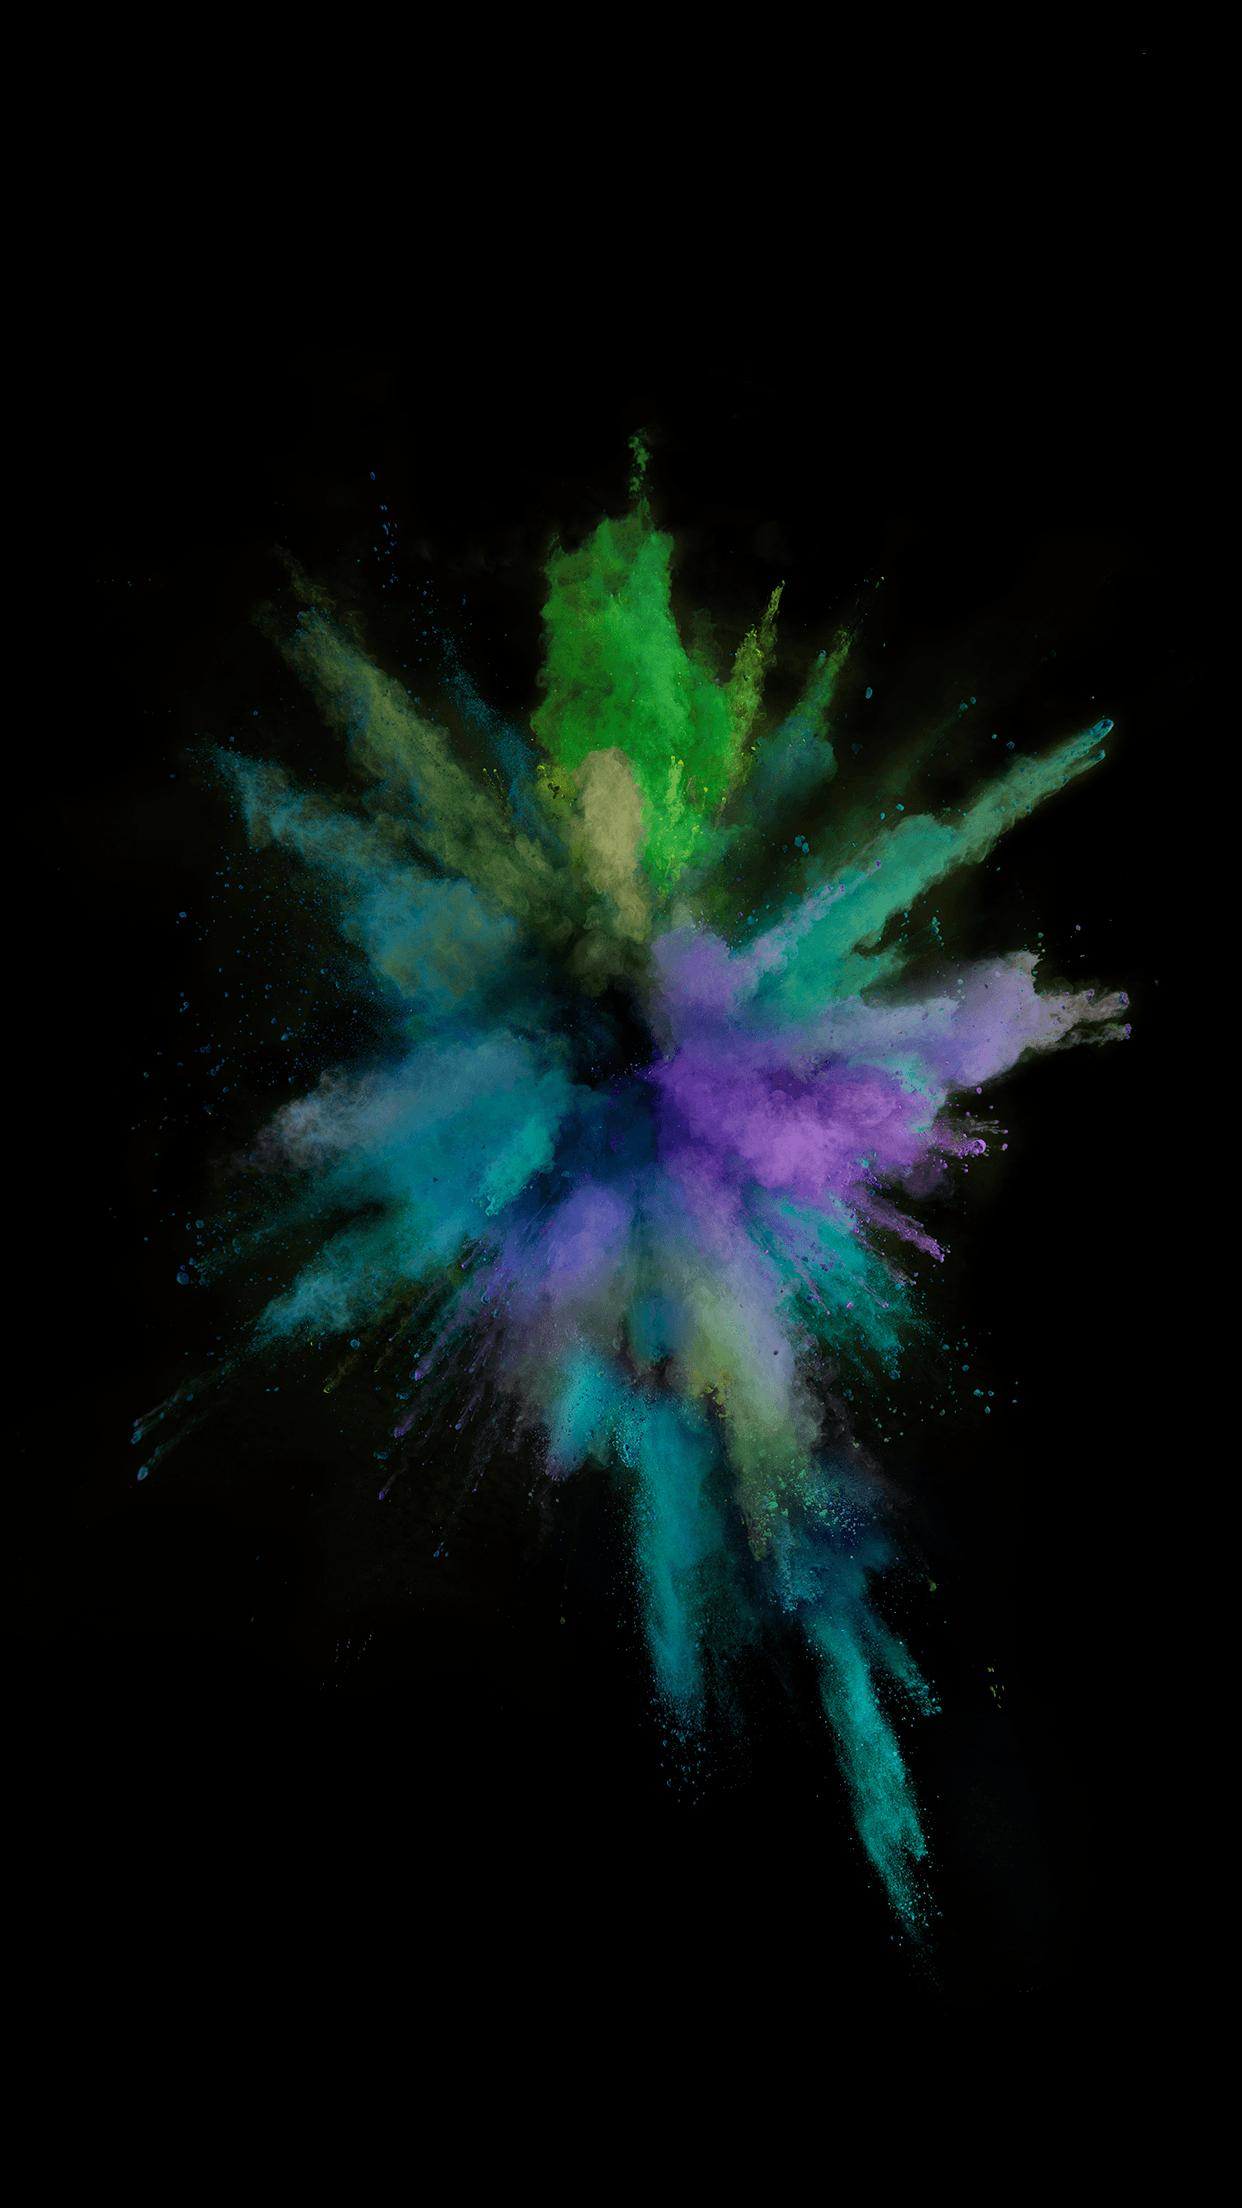 powder art fractal design iphone graphic background